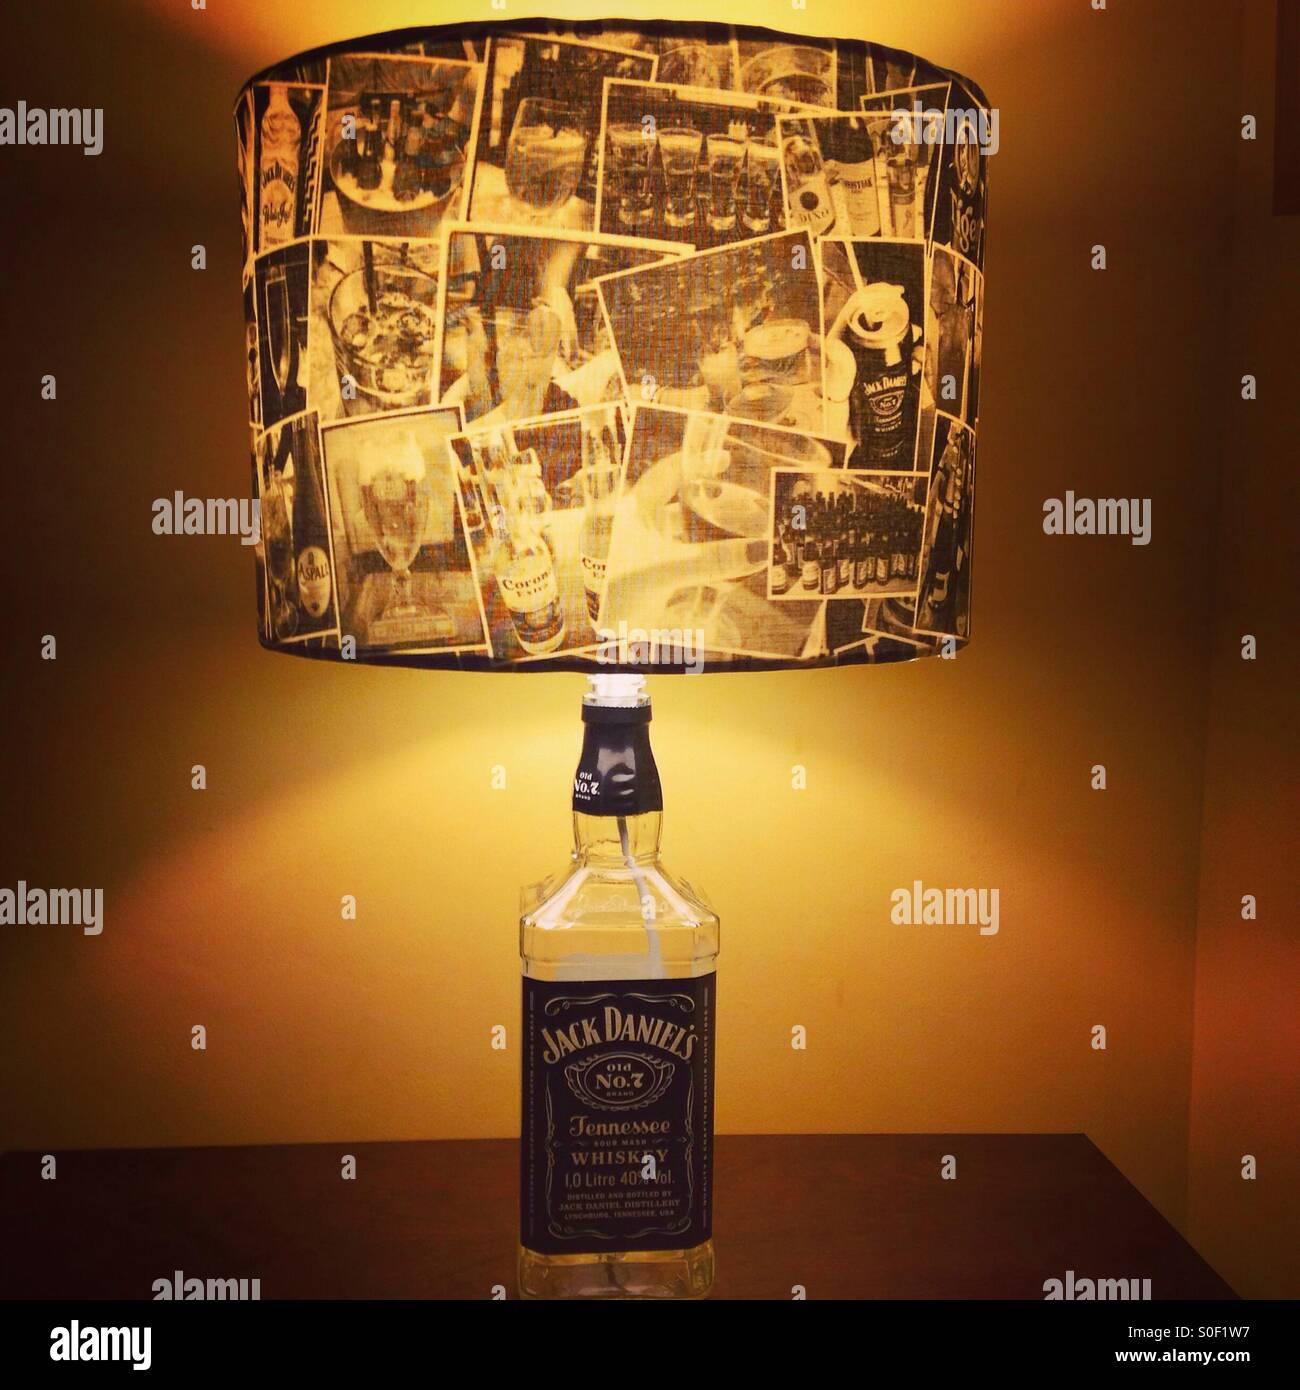 Jack Daniels Bottle Lamp   Stock Image